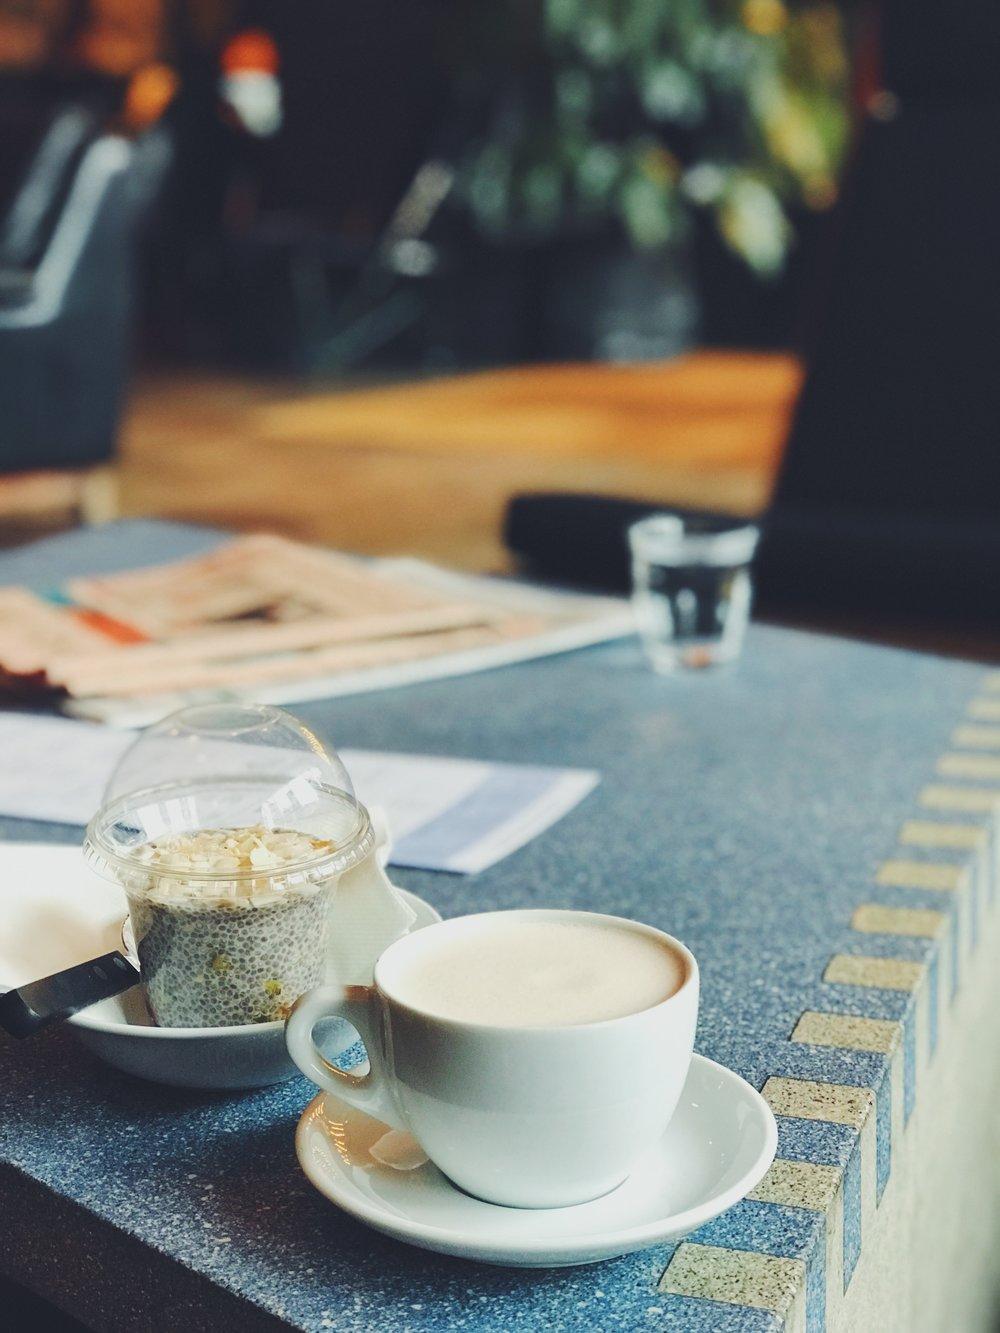 Chia pod and chai almond milk latte - still starting the day clean!